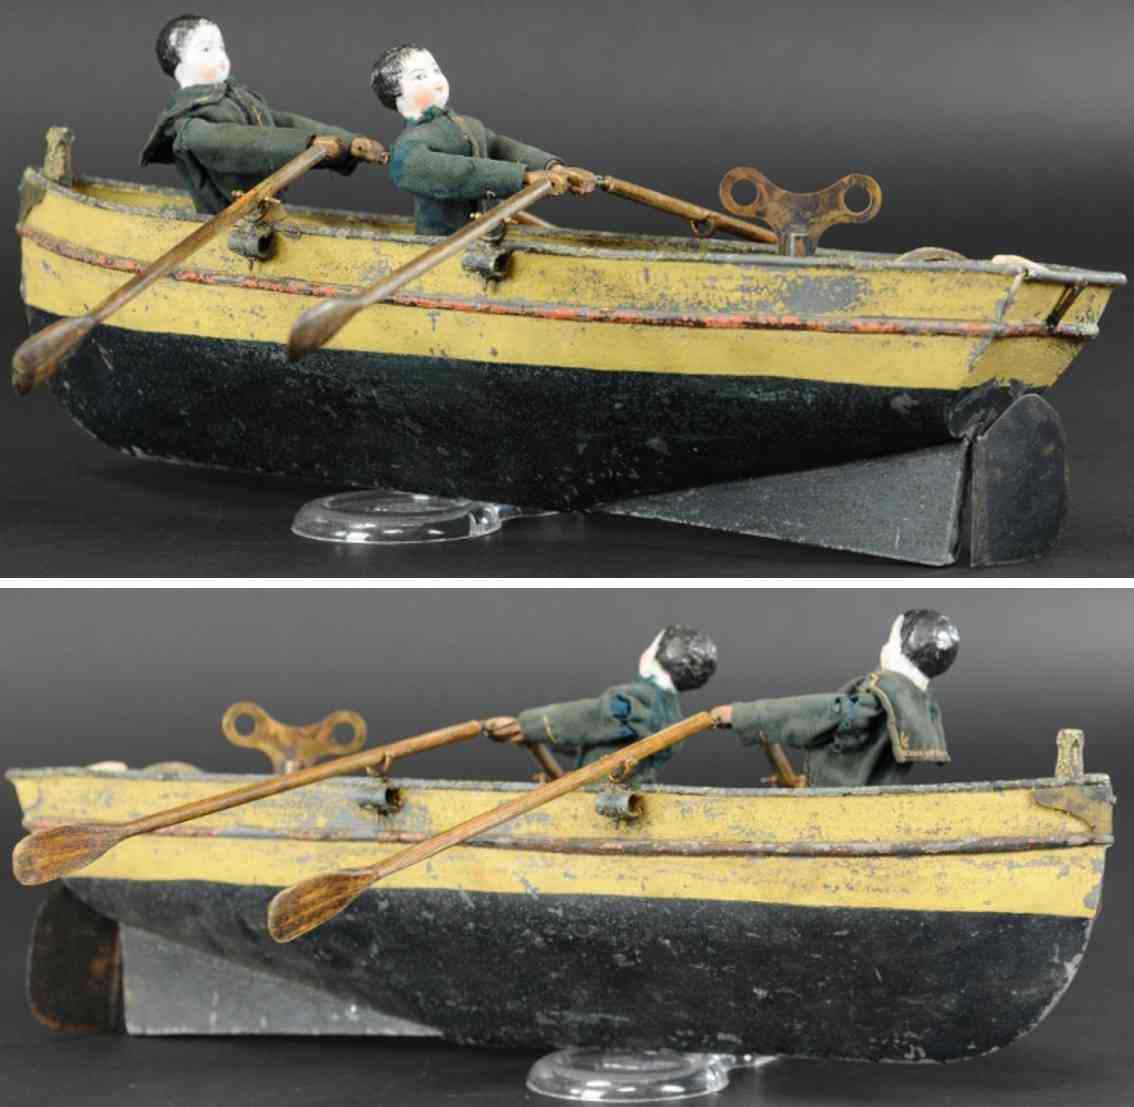 blech spielzeug ruderboot zwei figuren porzellankopf